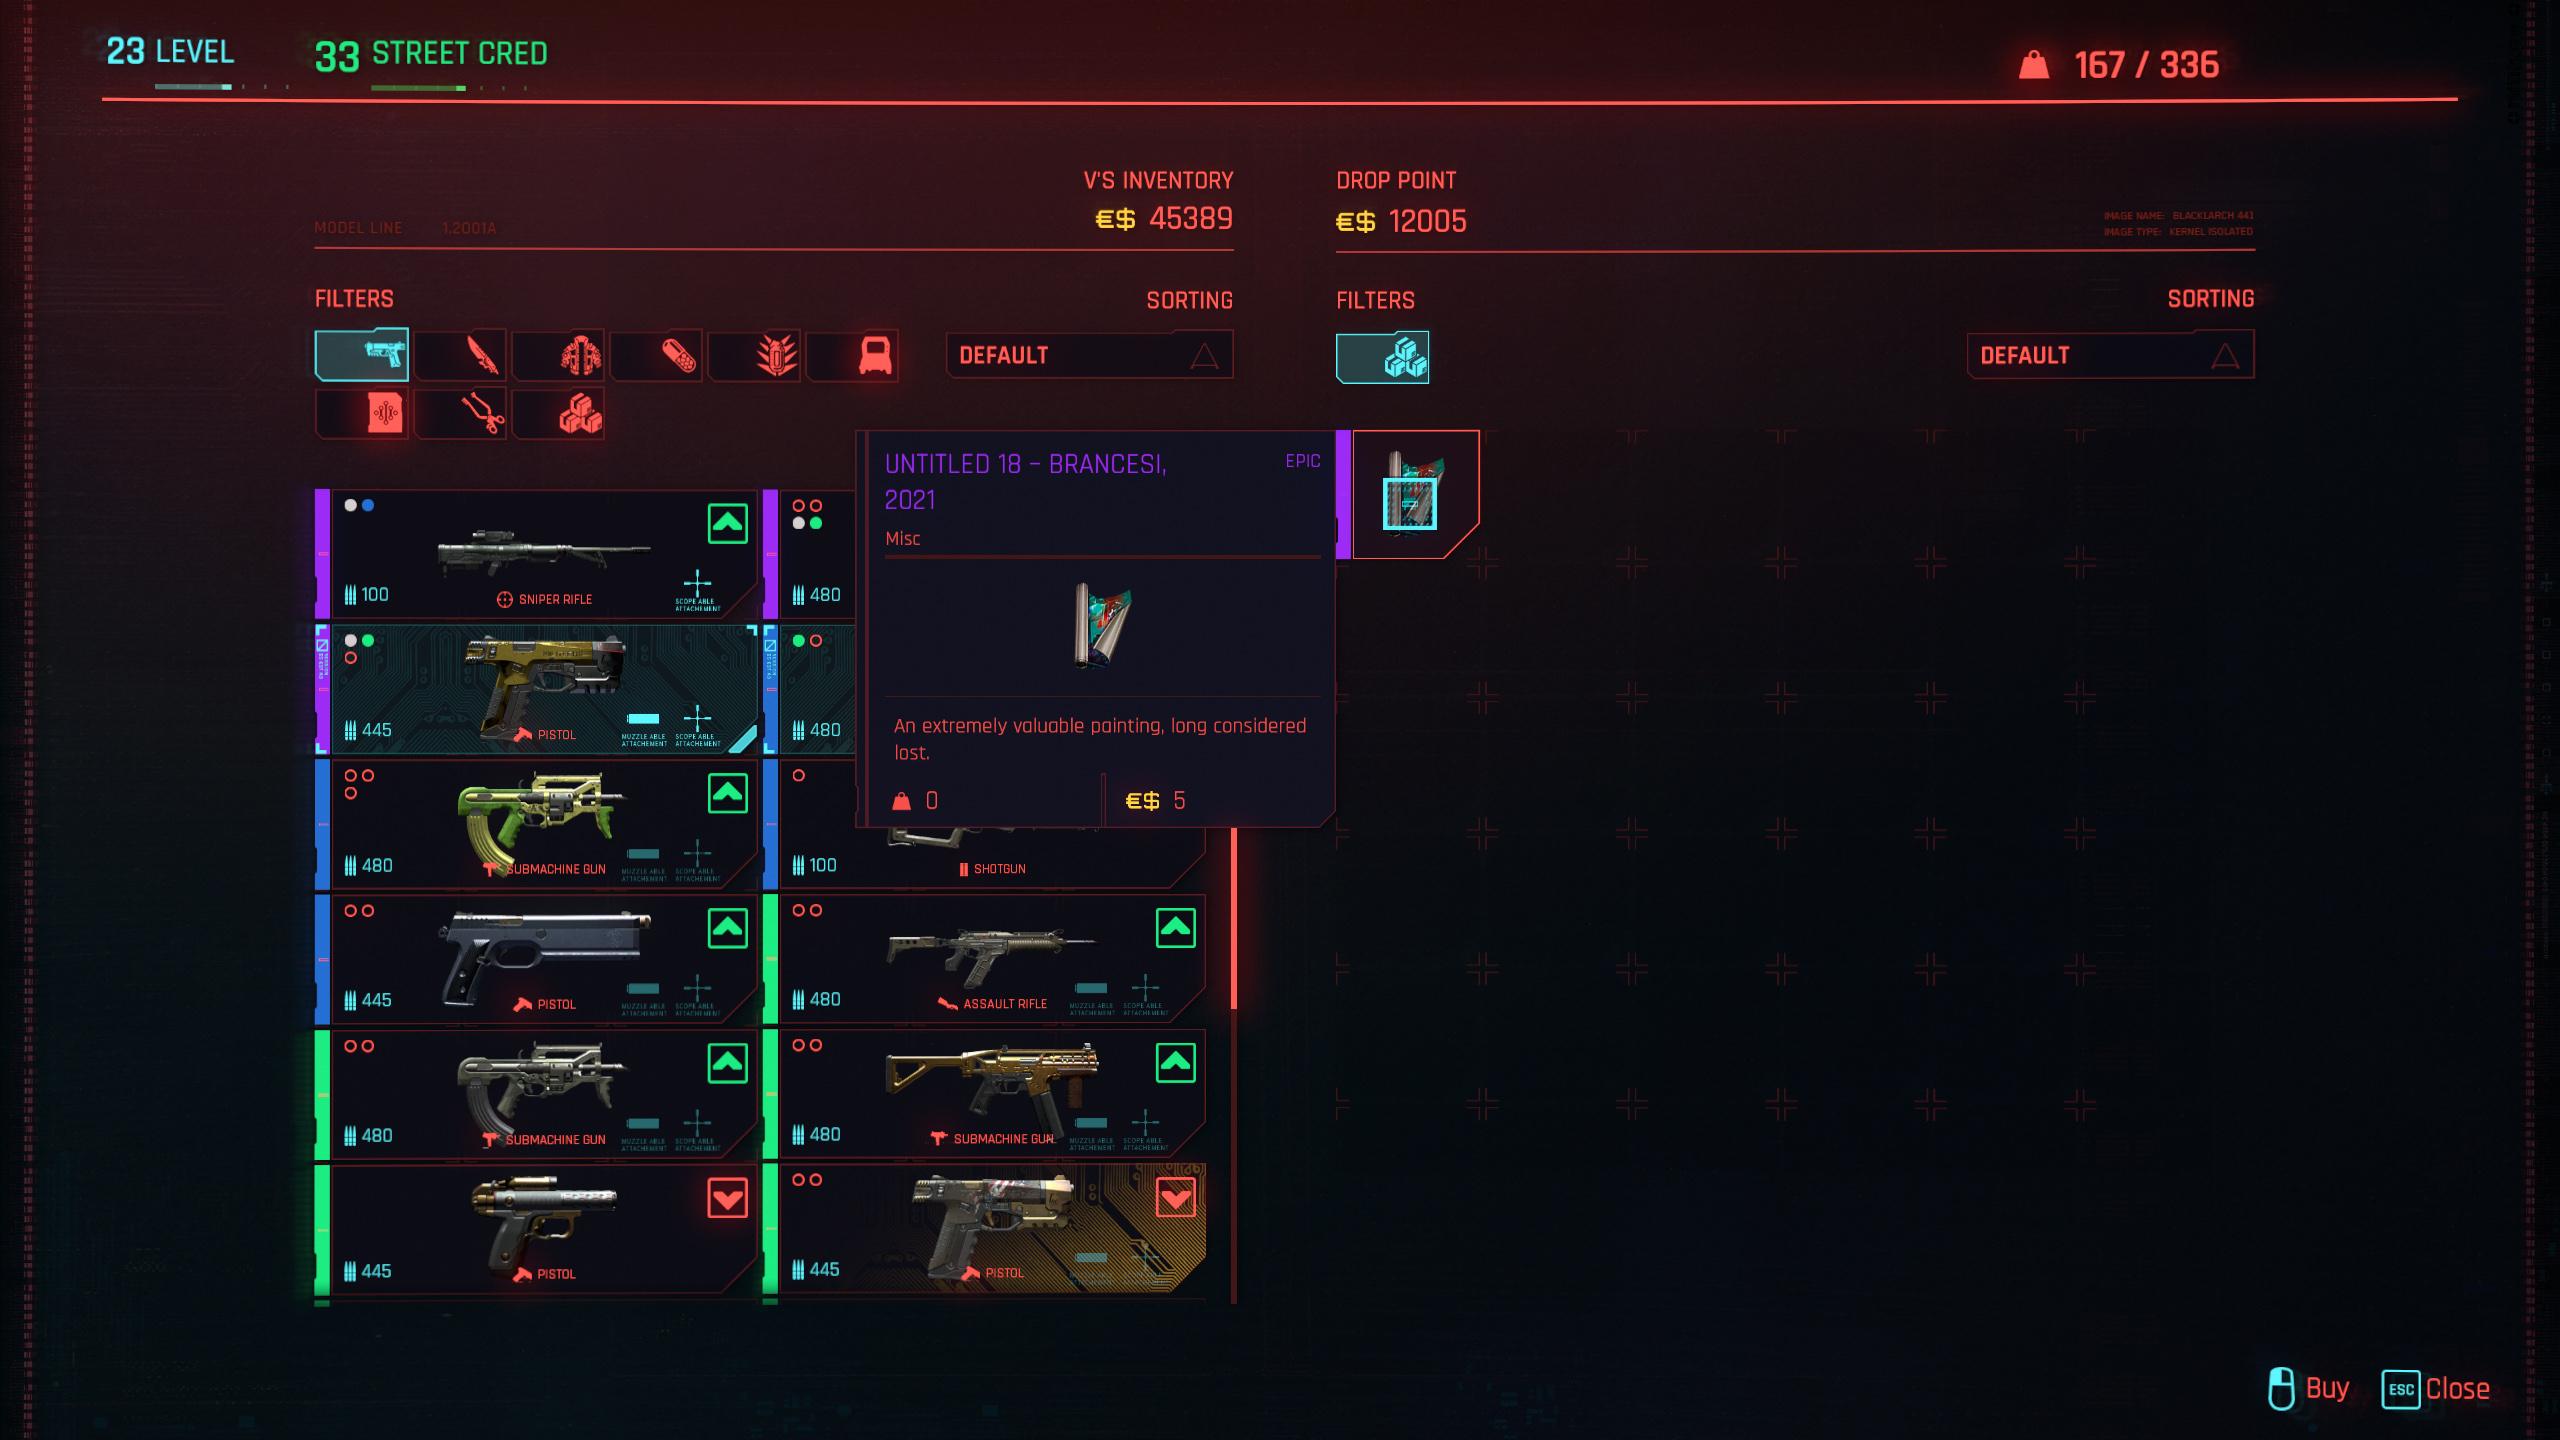 cyberpunk 2077 money glitch - space oddity money glitch